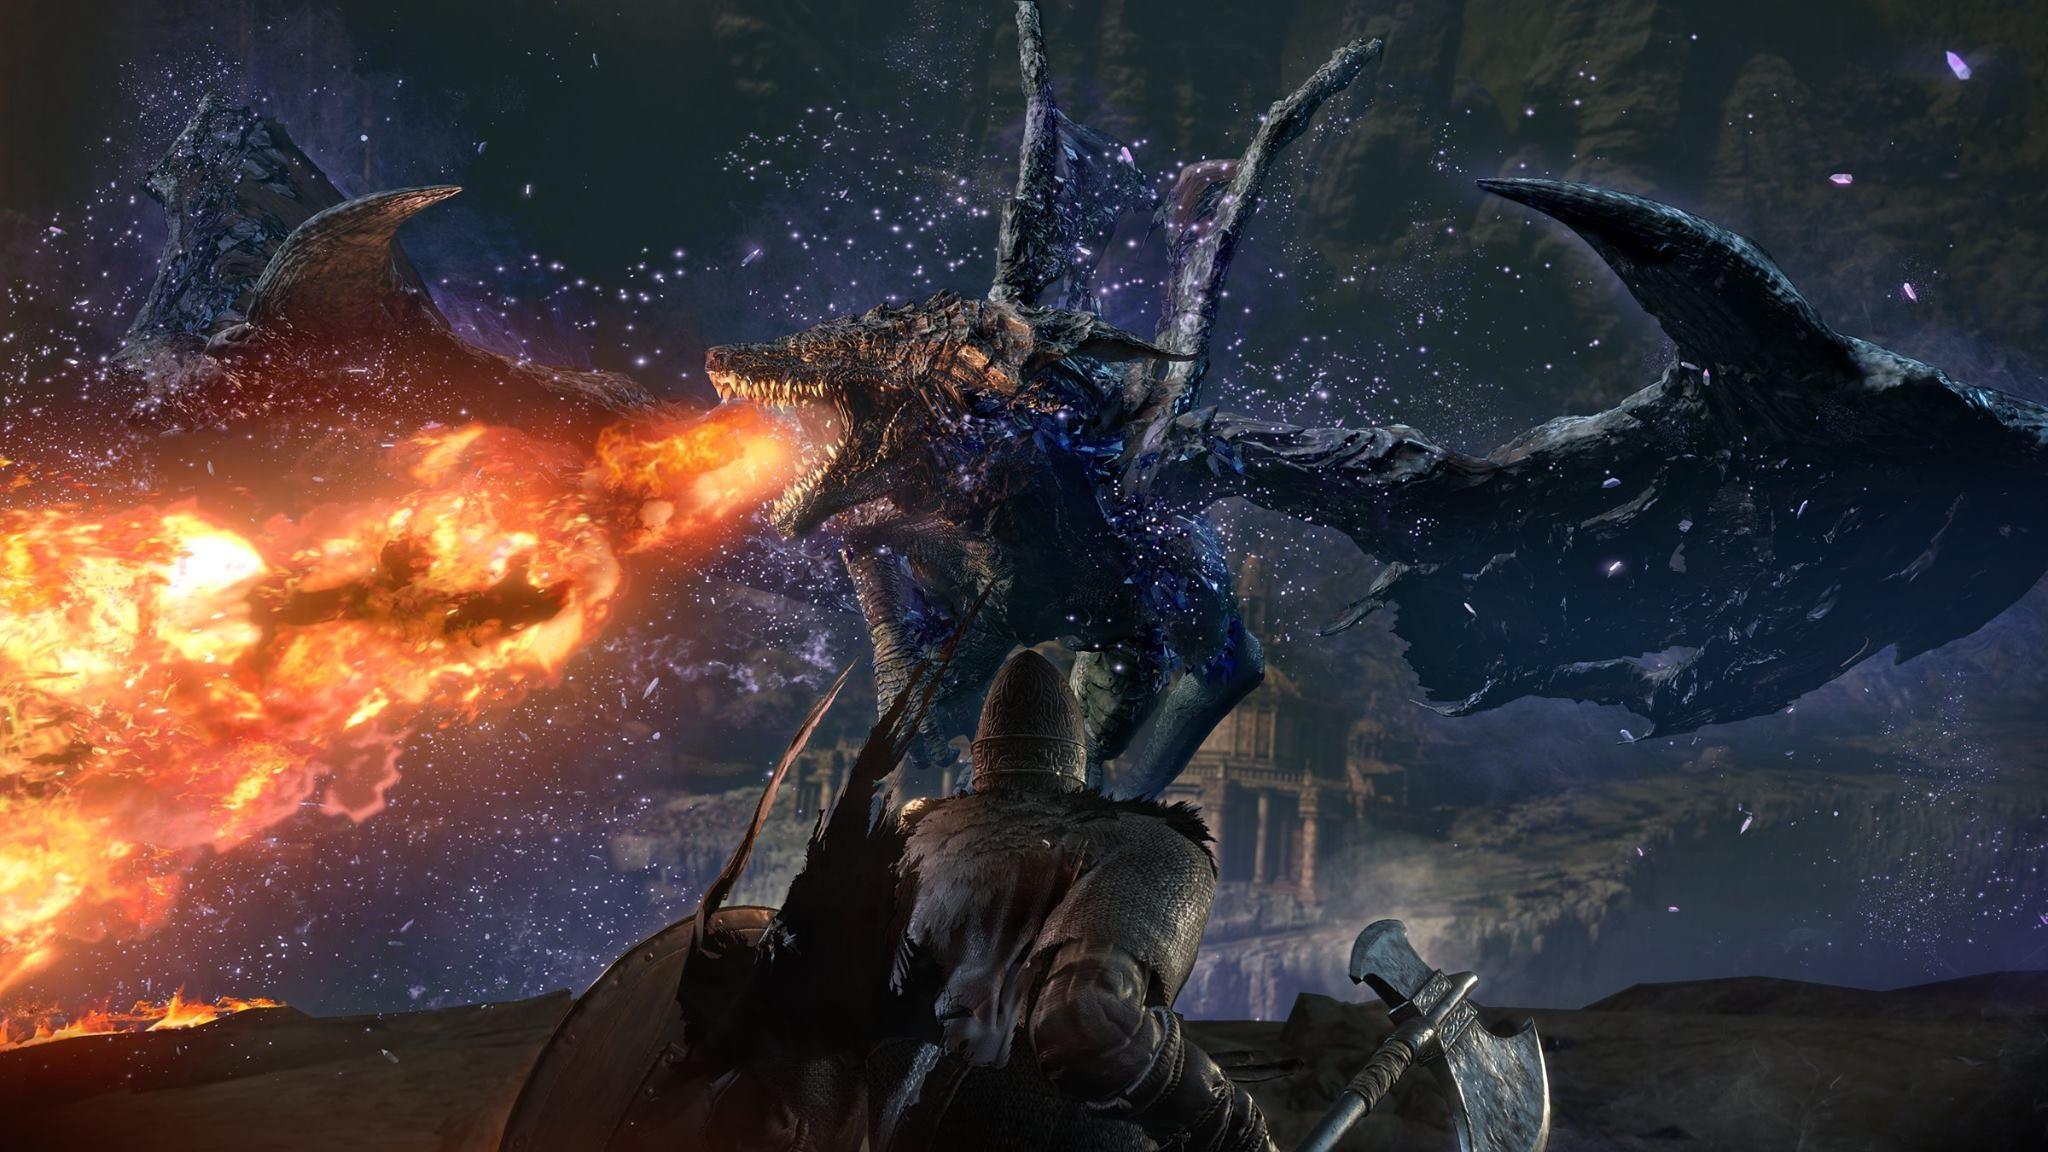 Image for Dark Souls 3: The Ringed City walkthrough - Shared Grave to Darkeater Midir